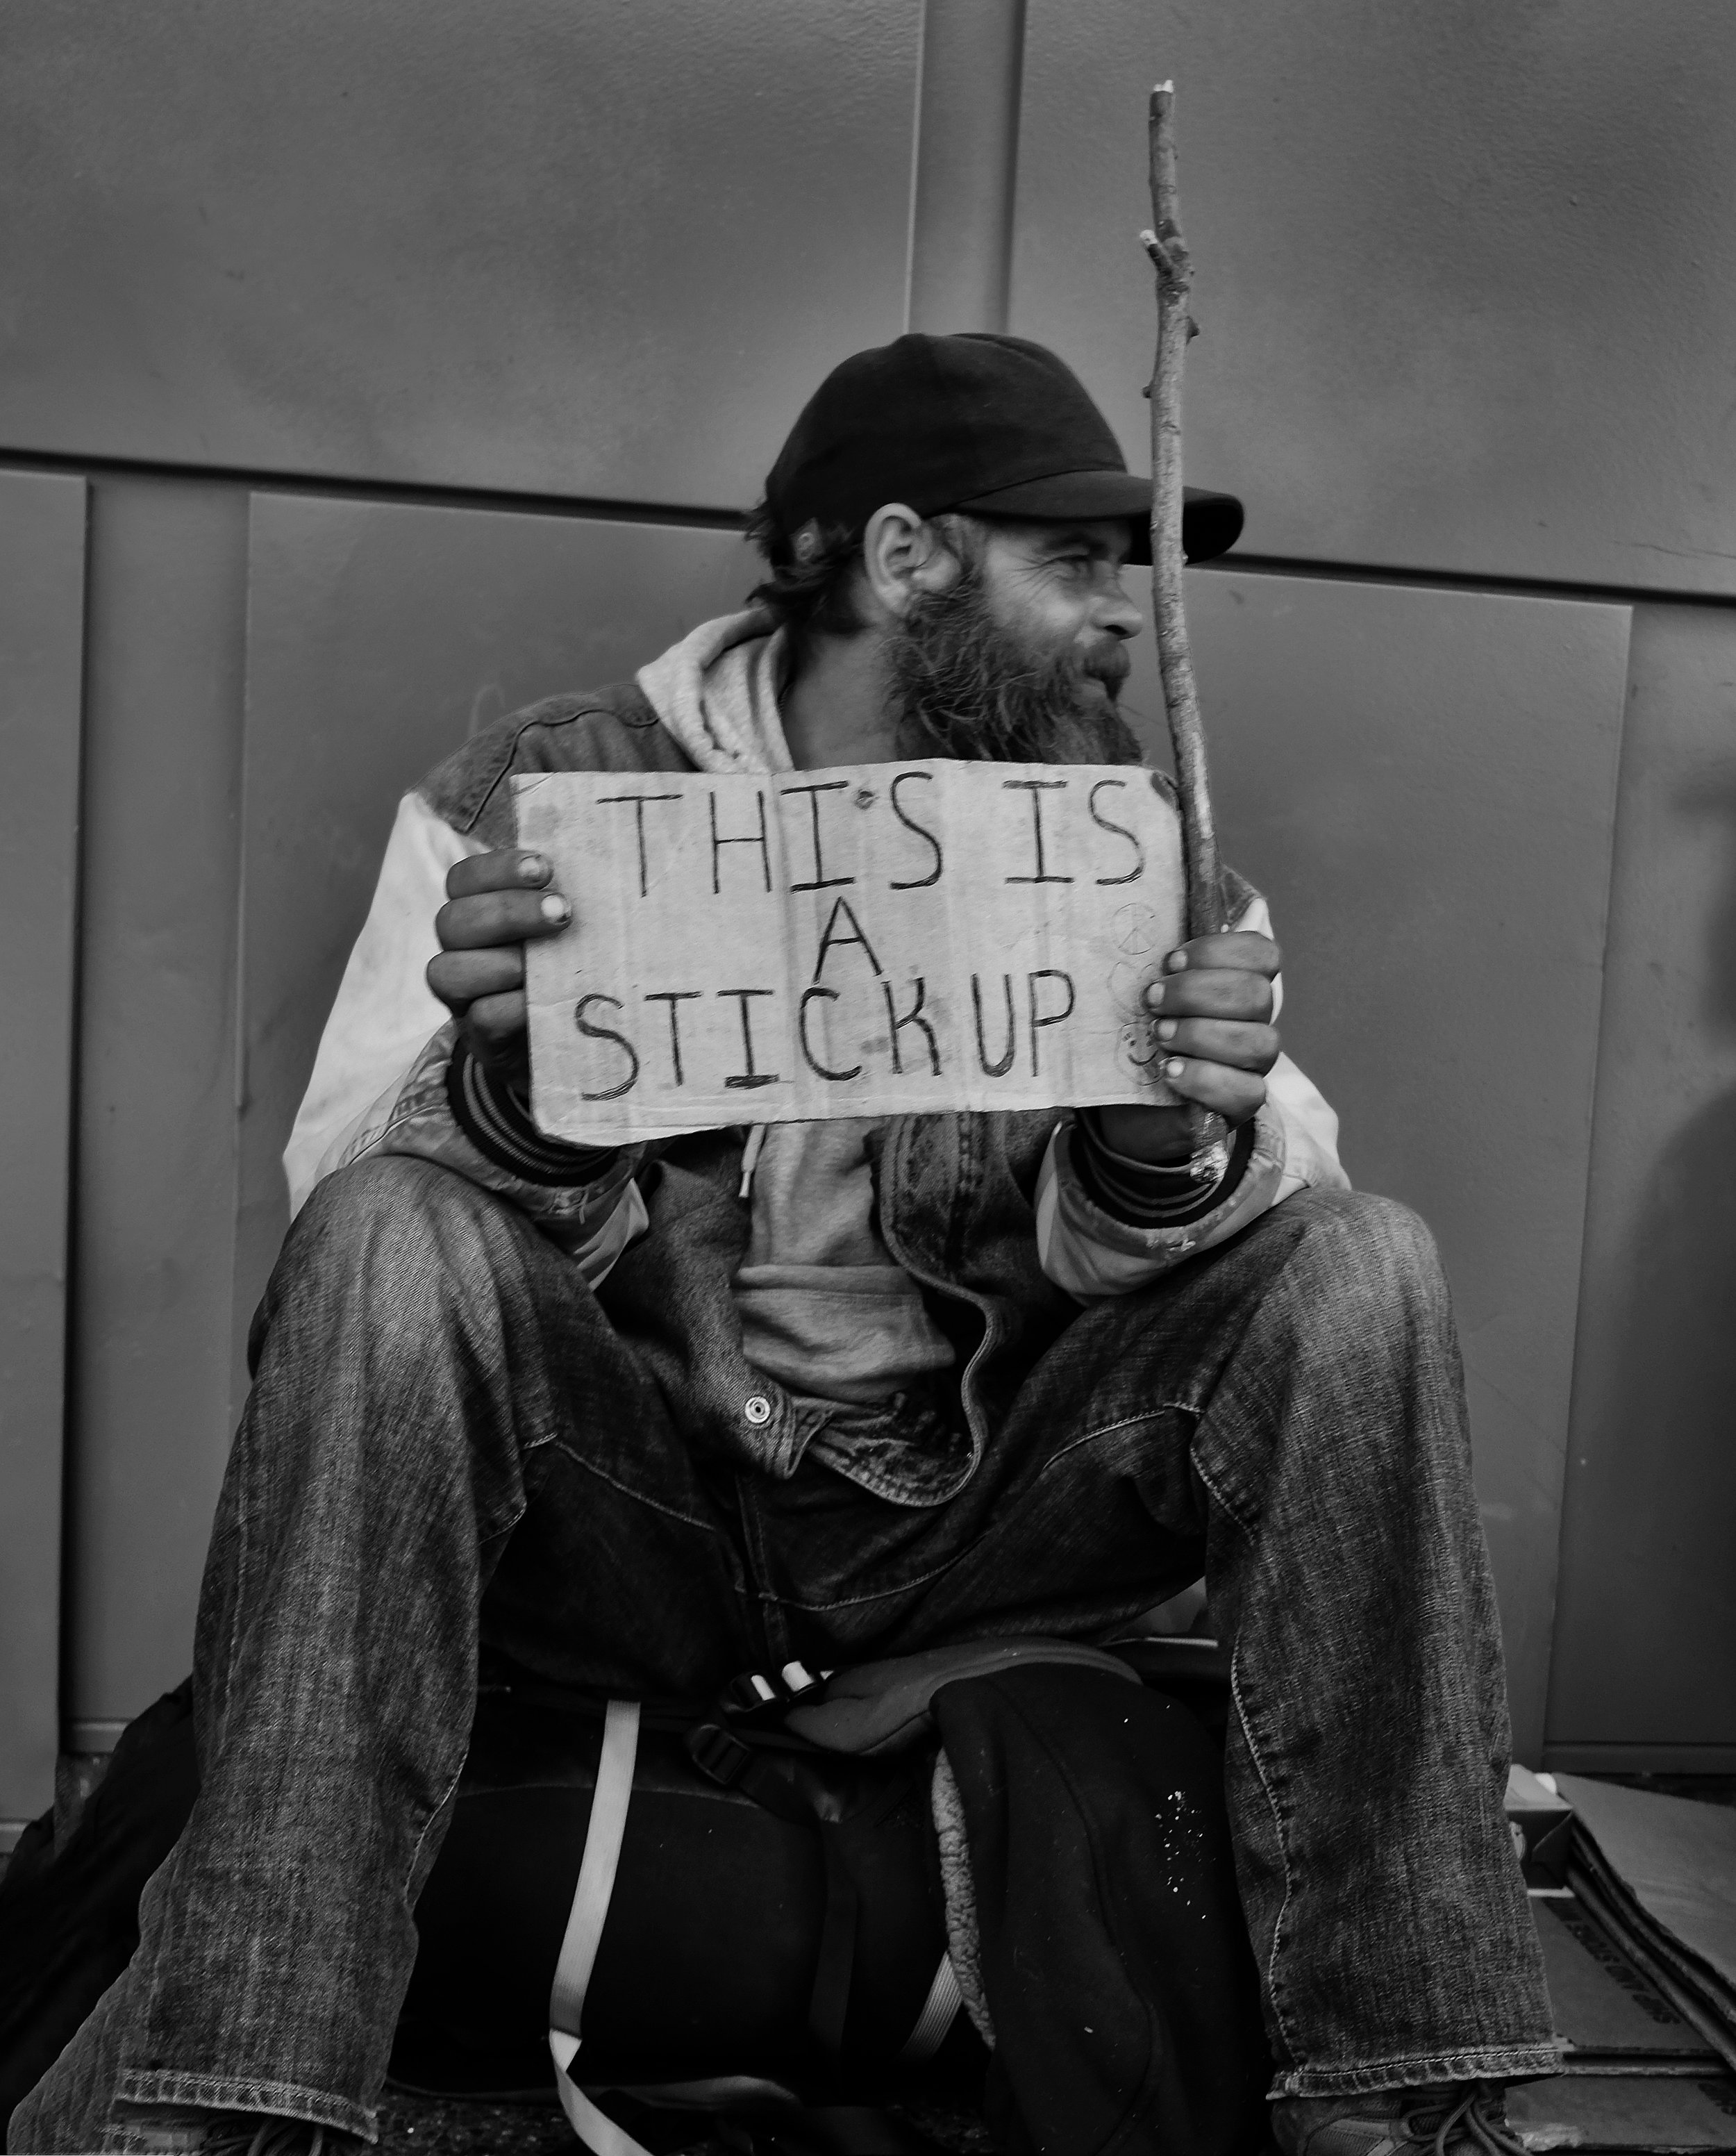 Stick Up.jpg